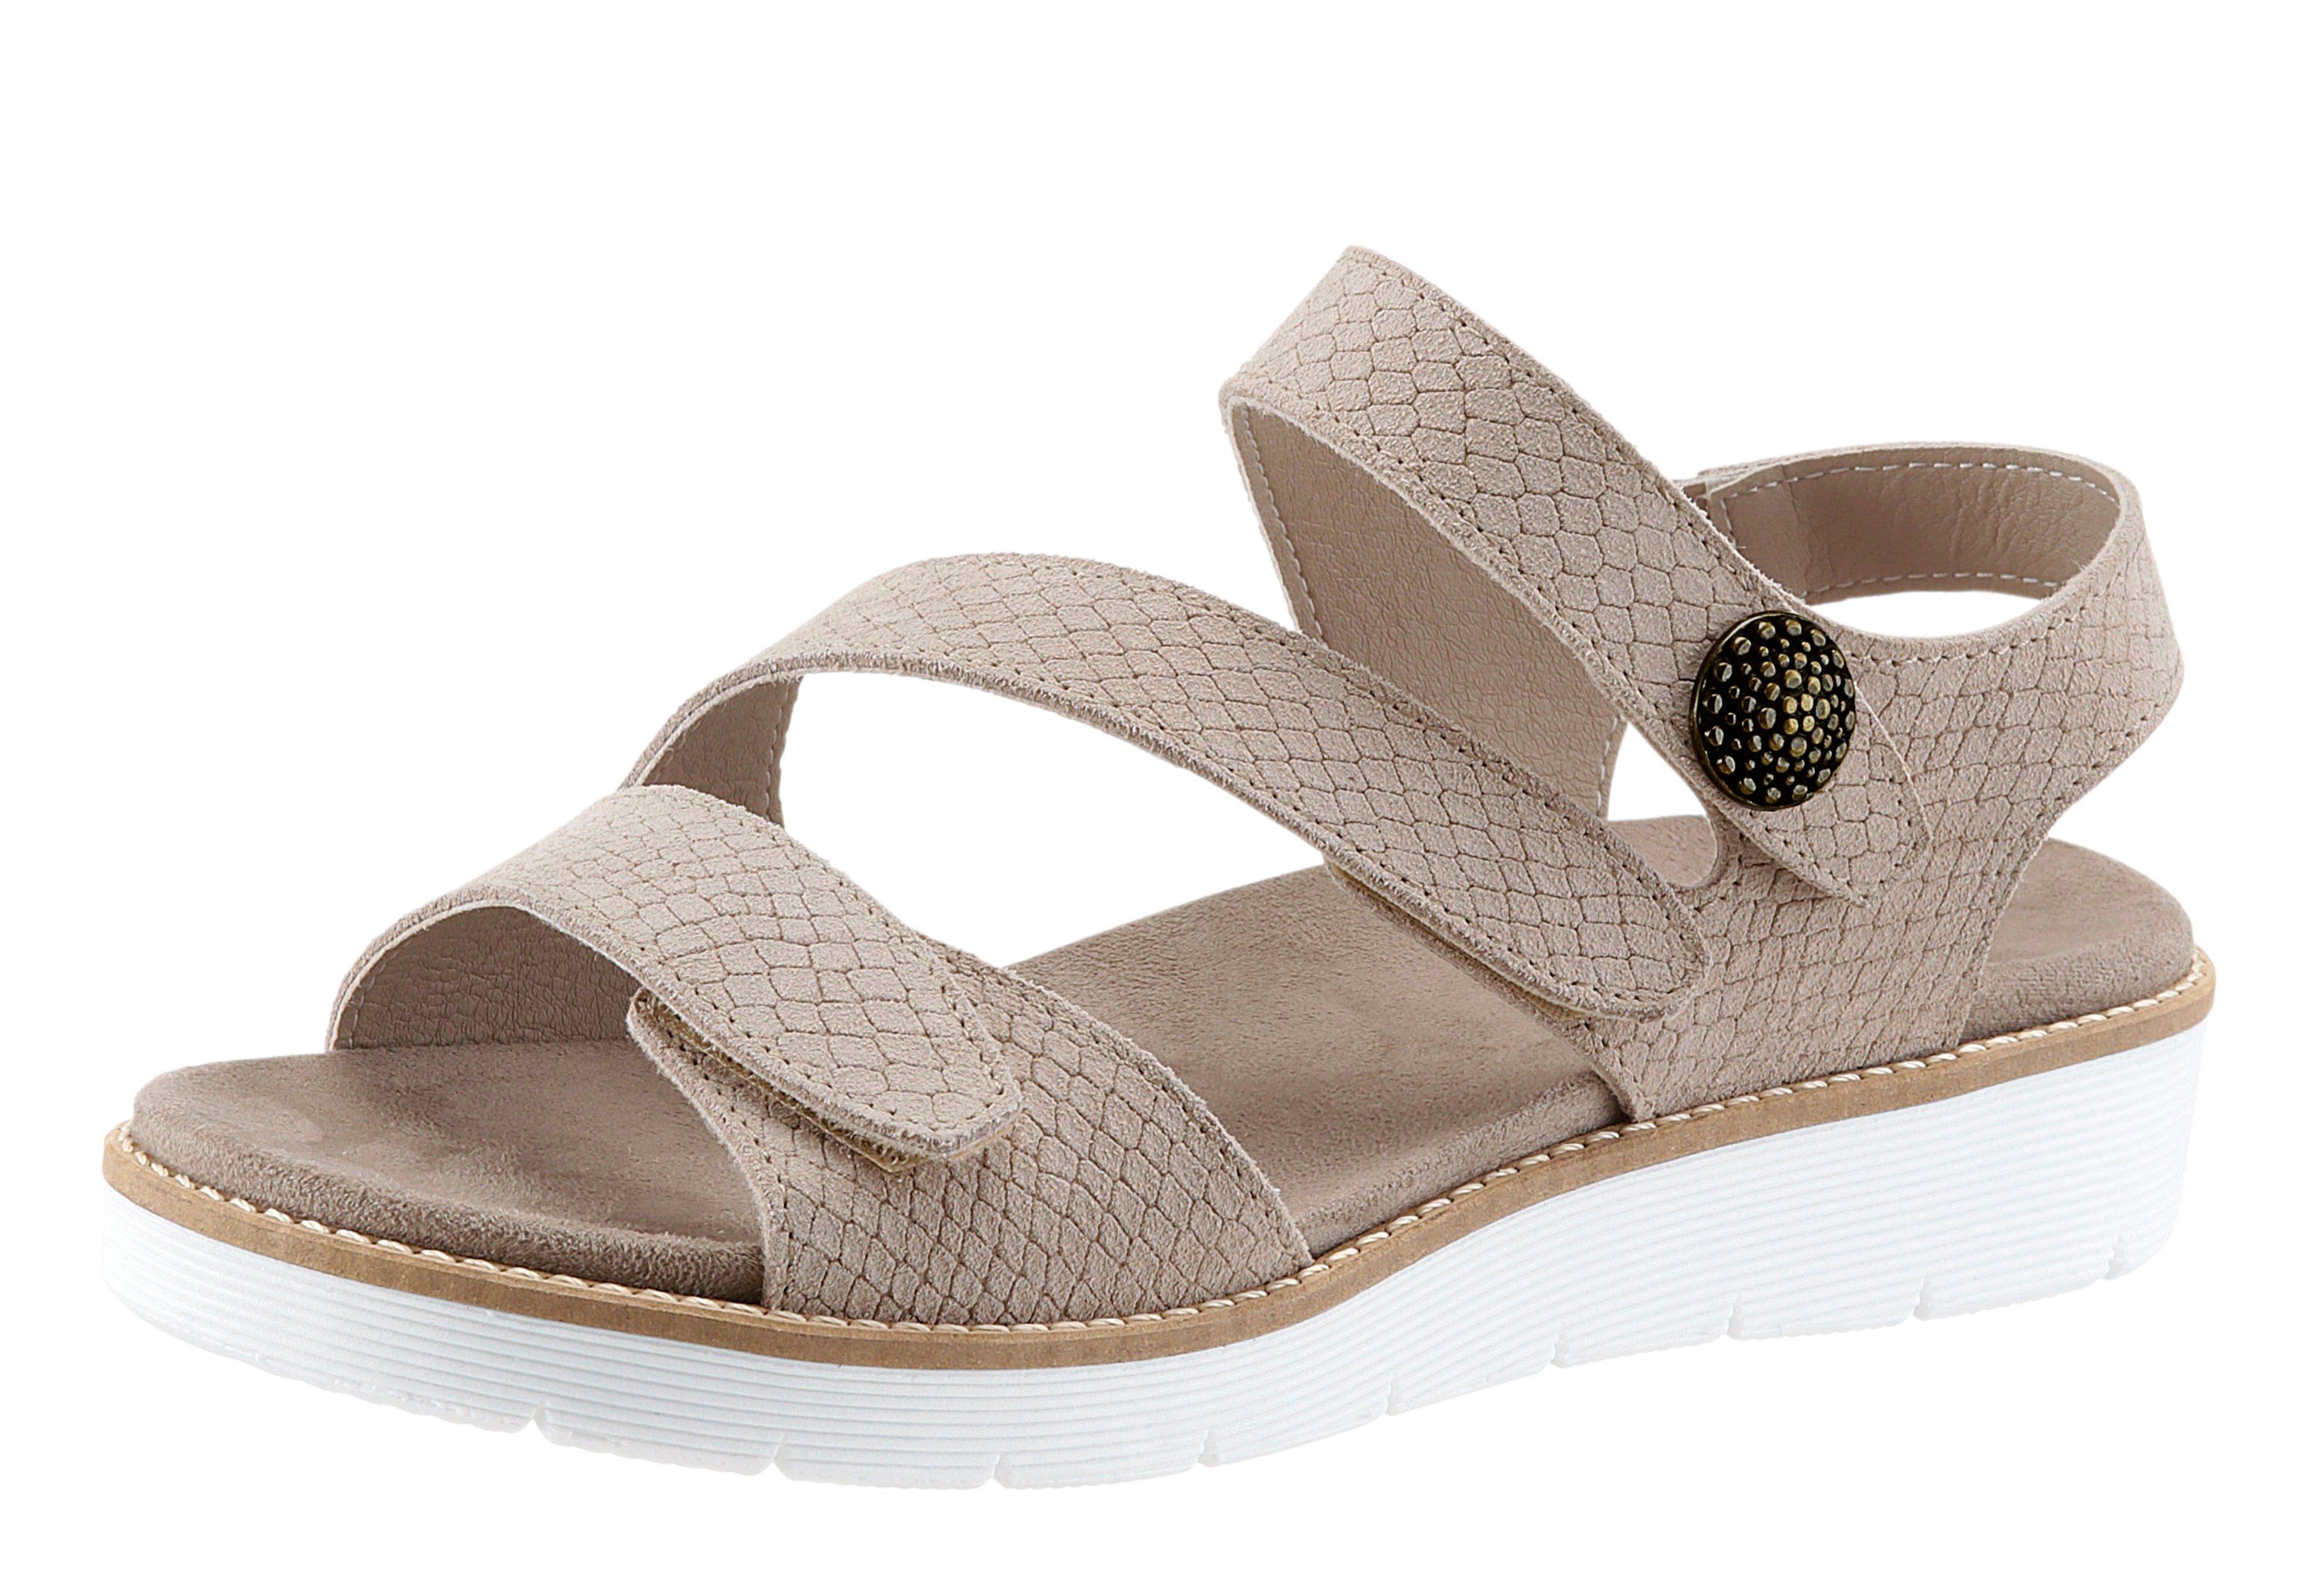 MayBe Sandale beige RXLWvI